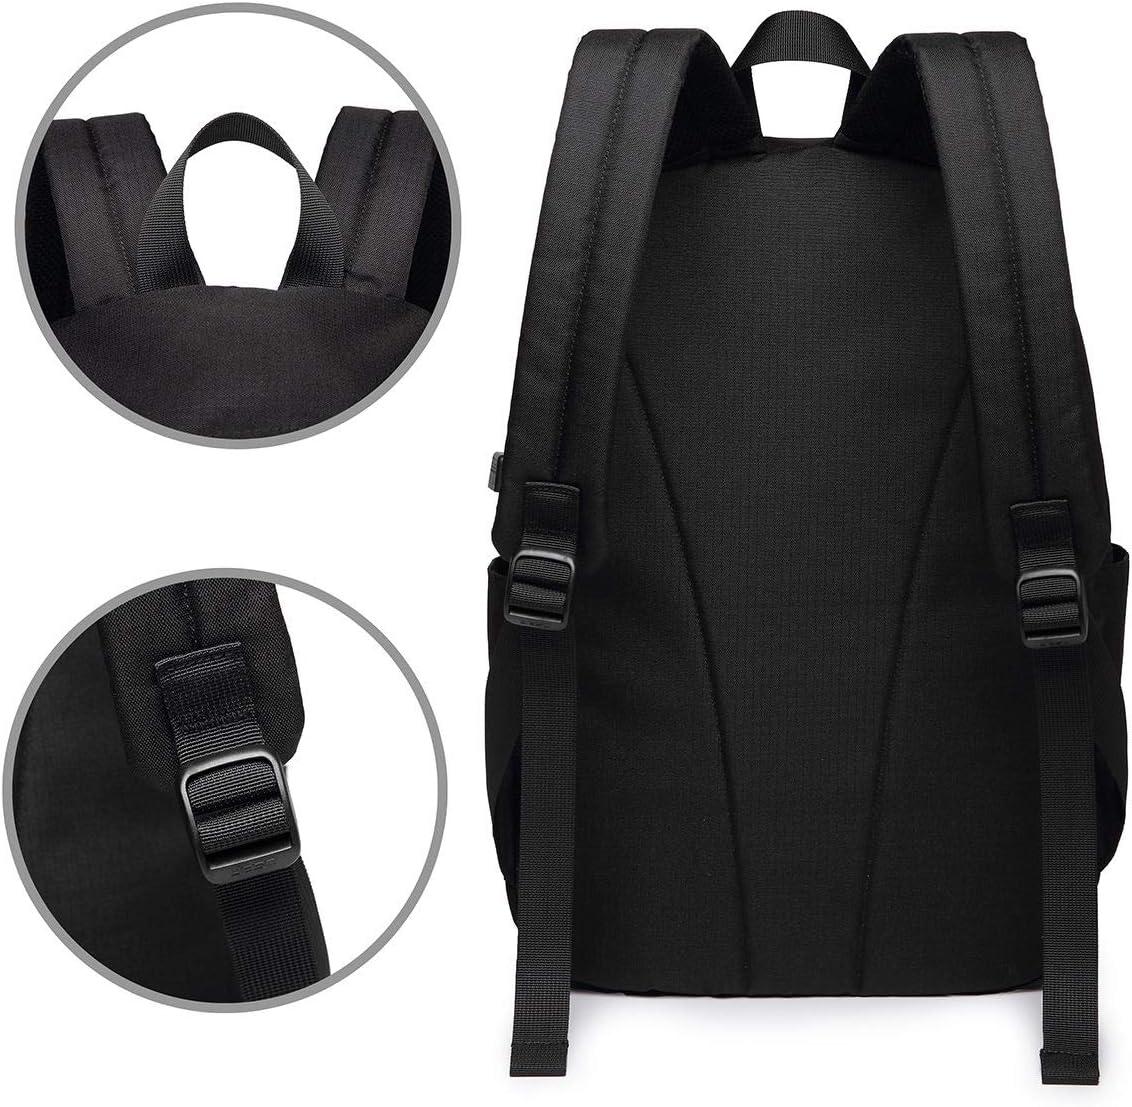 Bird Seamless Mode Laptop Backpack 17 Inch Business Travel Backpacks for Men Women Adjustable Shoulder Strap with USB Charging Port Black Mens and Womens for School